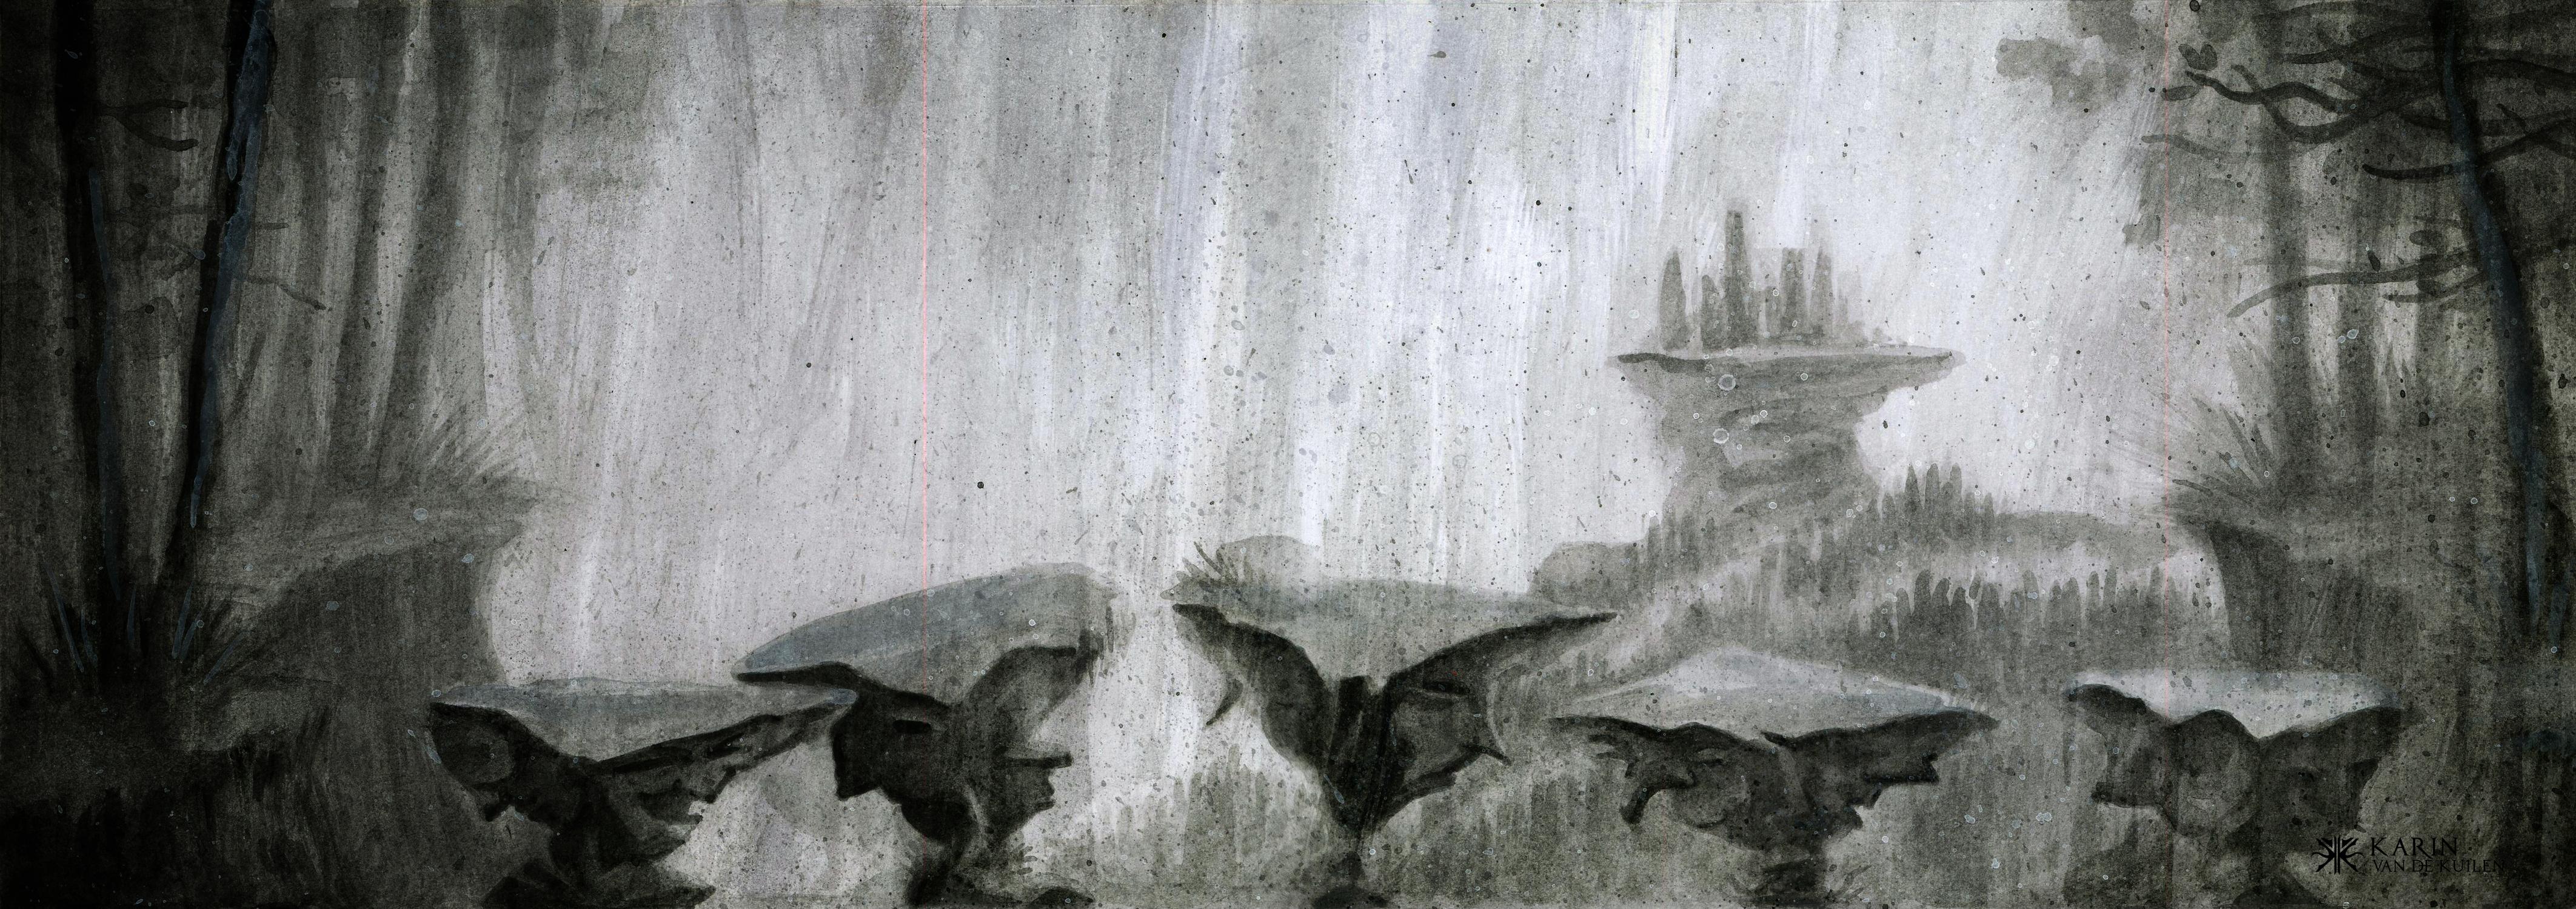 Shadows hideout Artwork by Karin  van de Kuilen